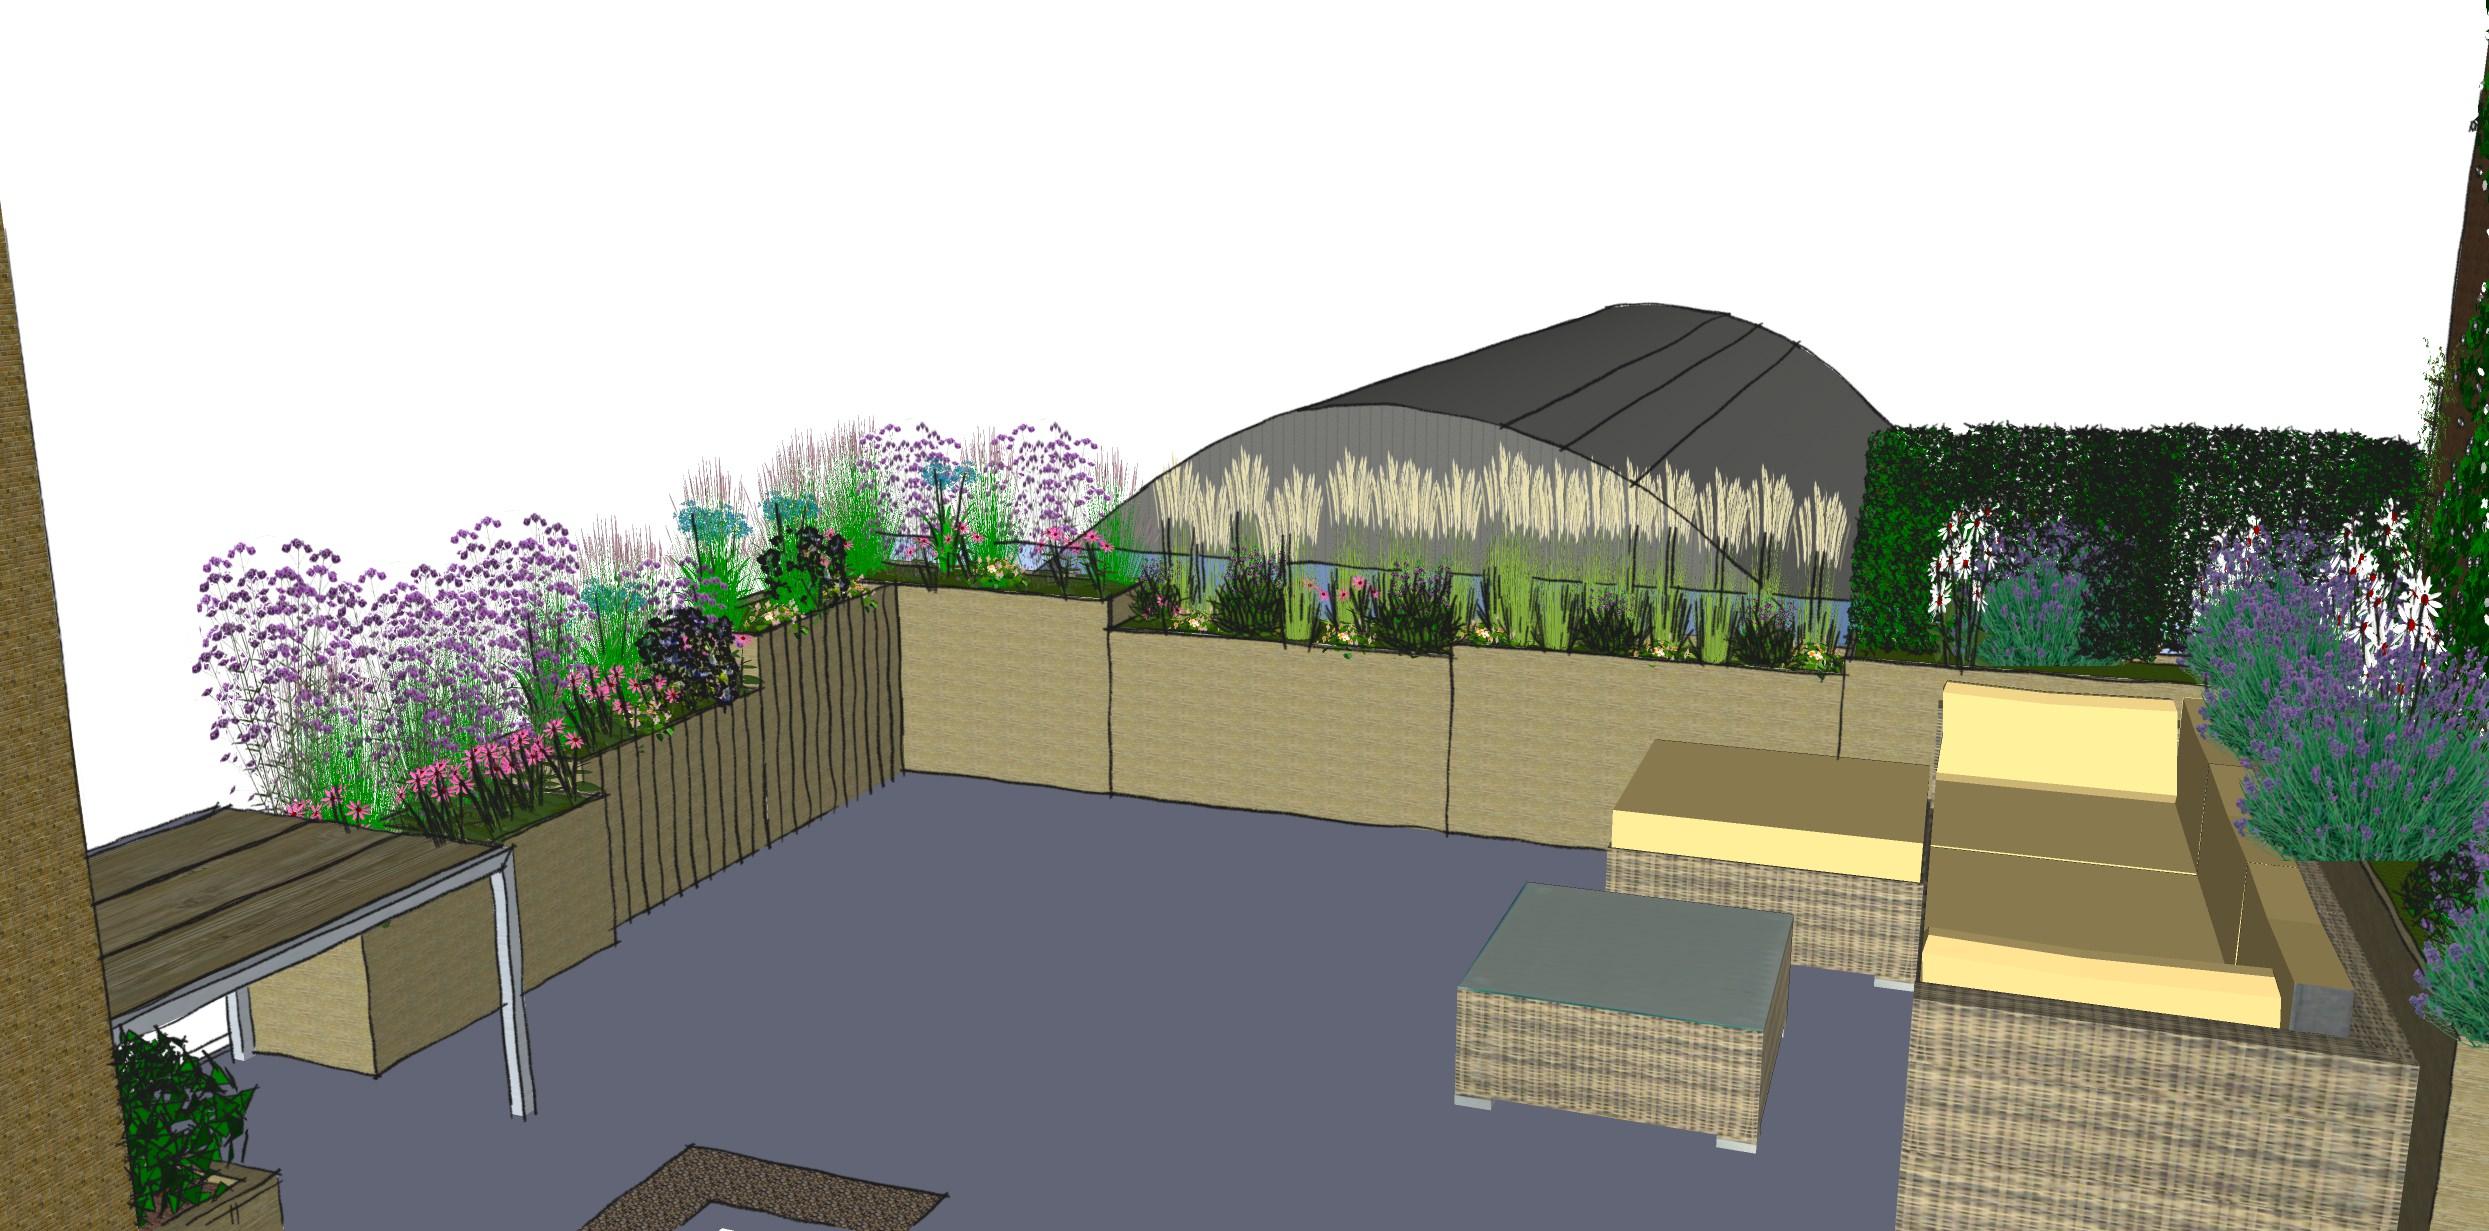 Low Maintenance Garden Designs - Garden Club London